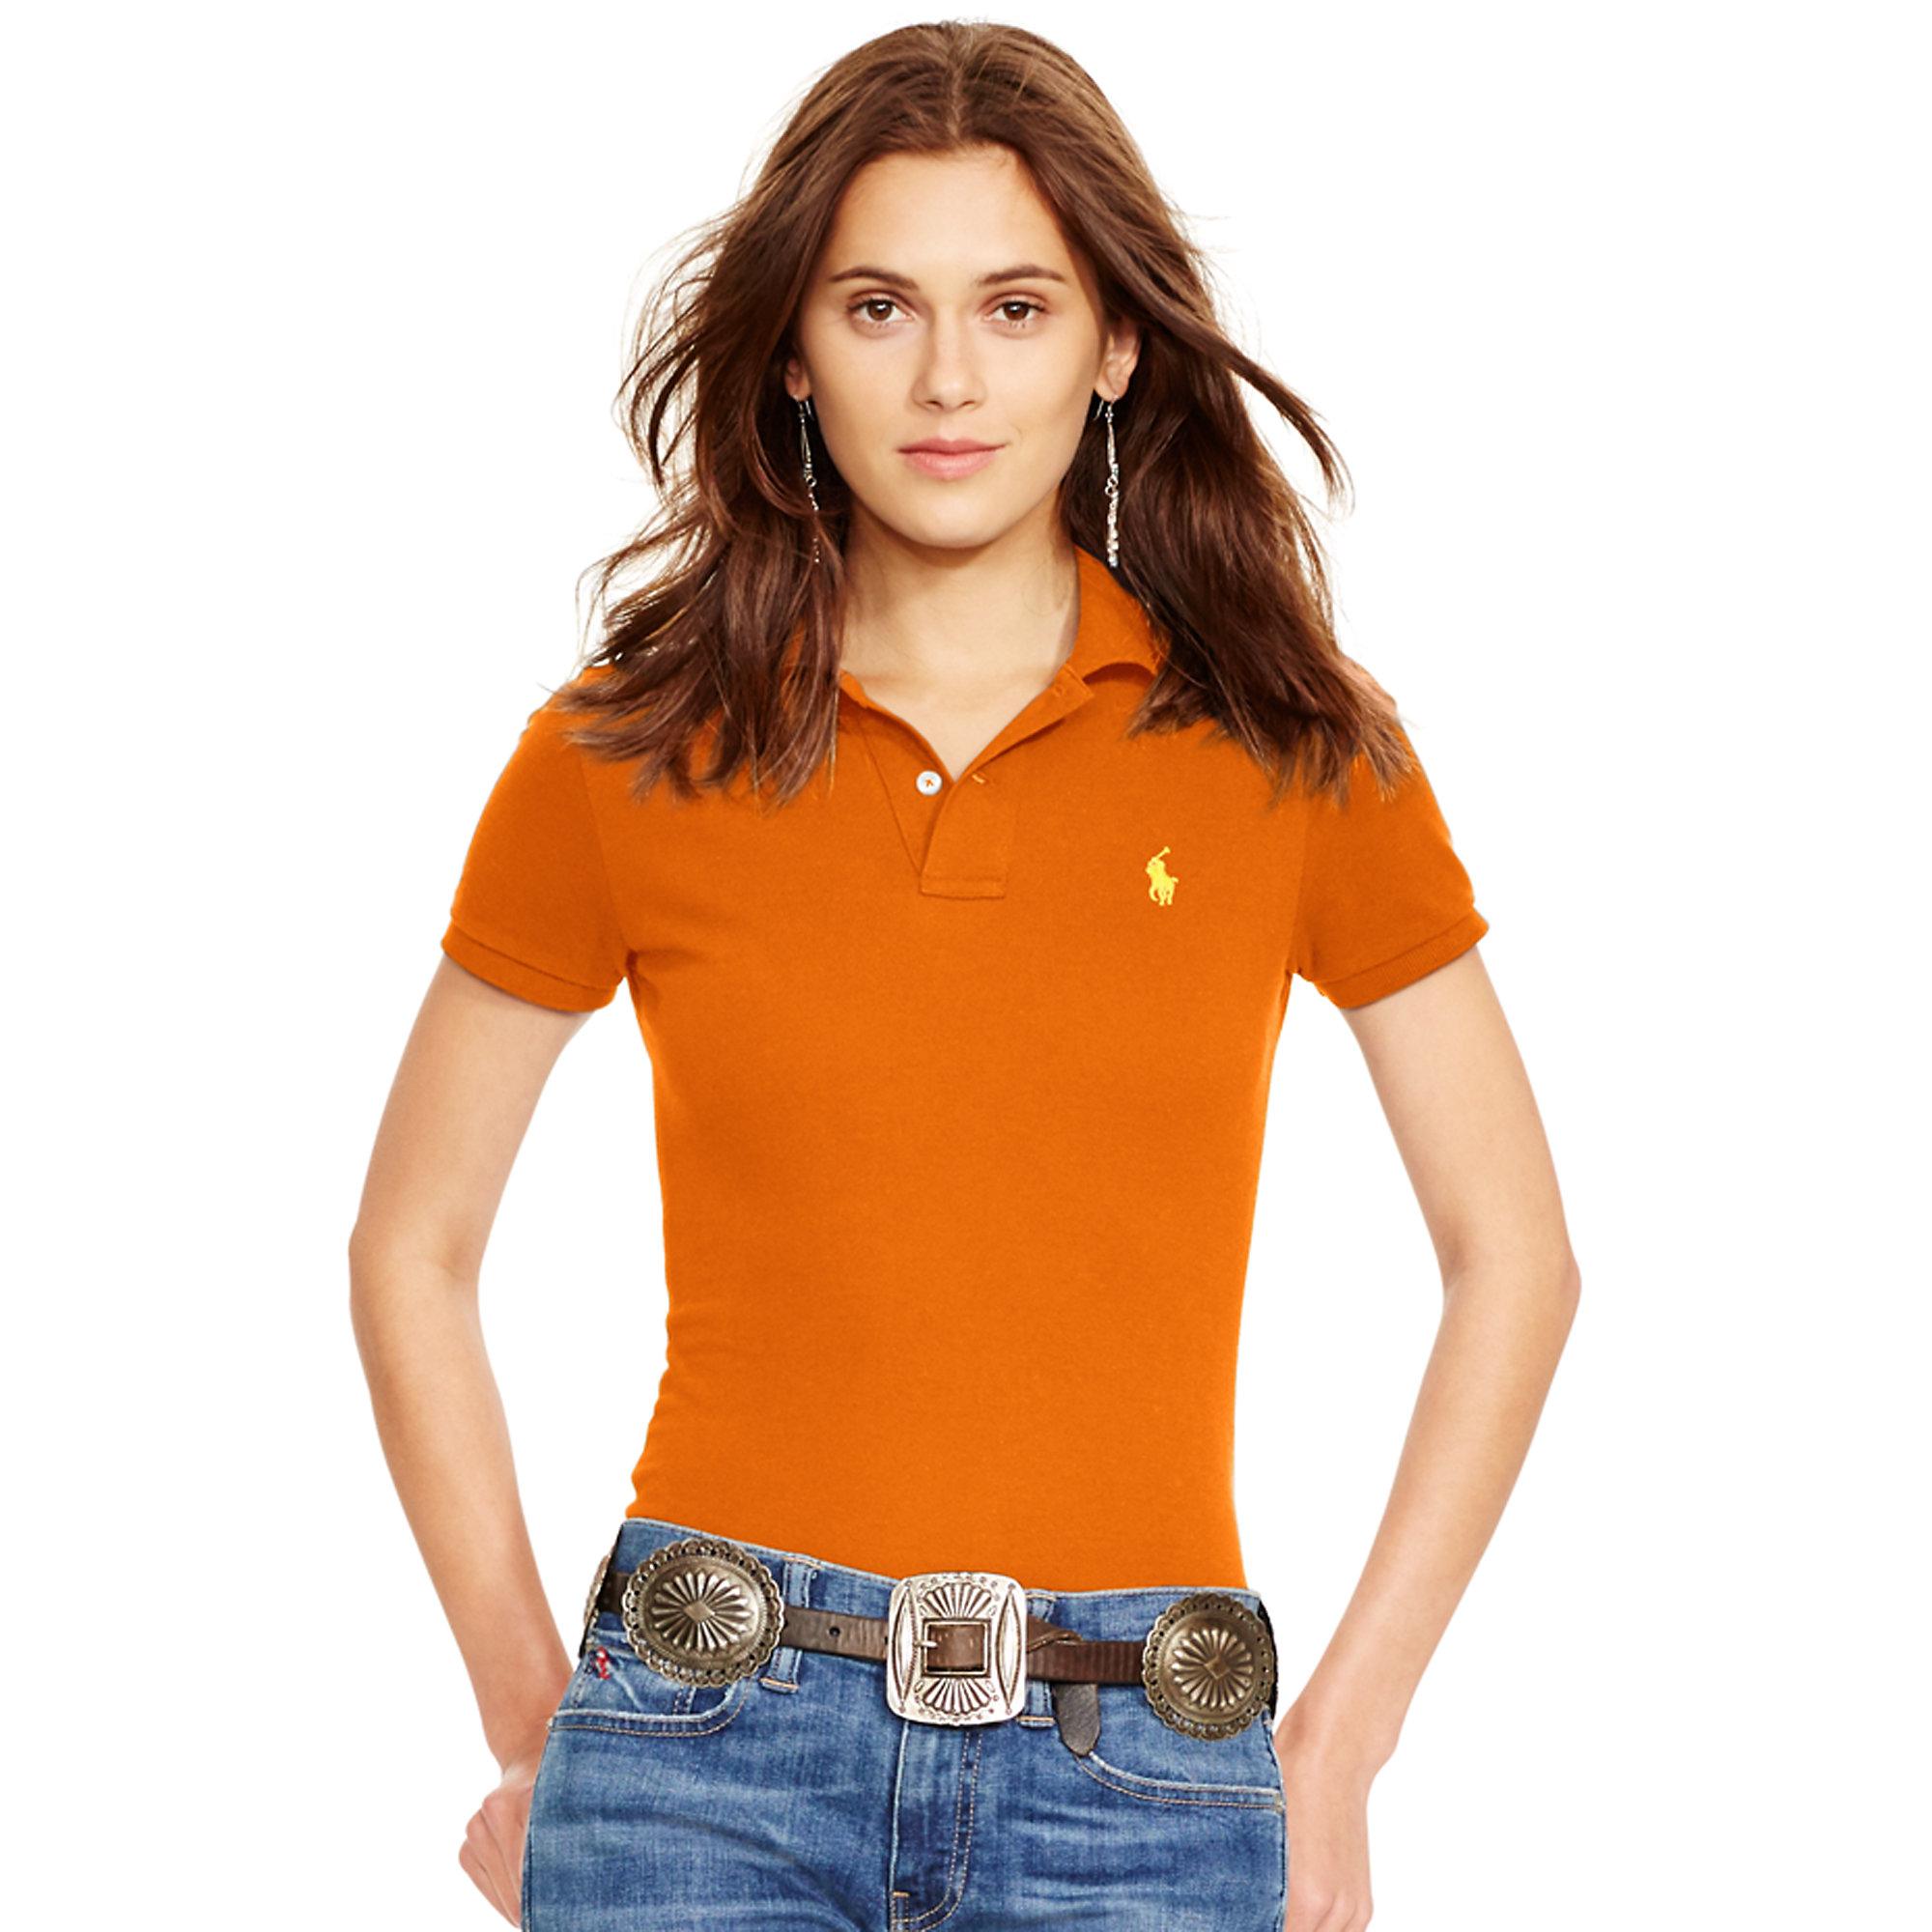 Shirt Polo Fit Orange Lauren Skinny Ralph bYgf6y7